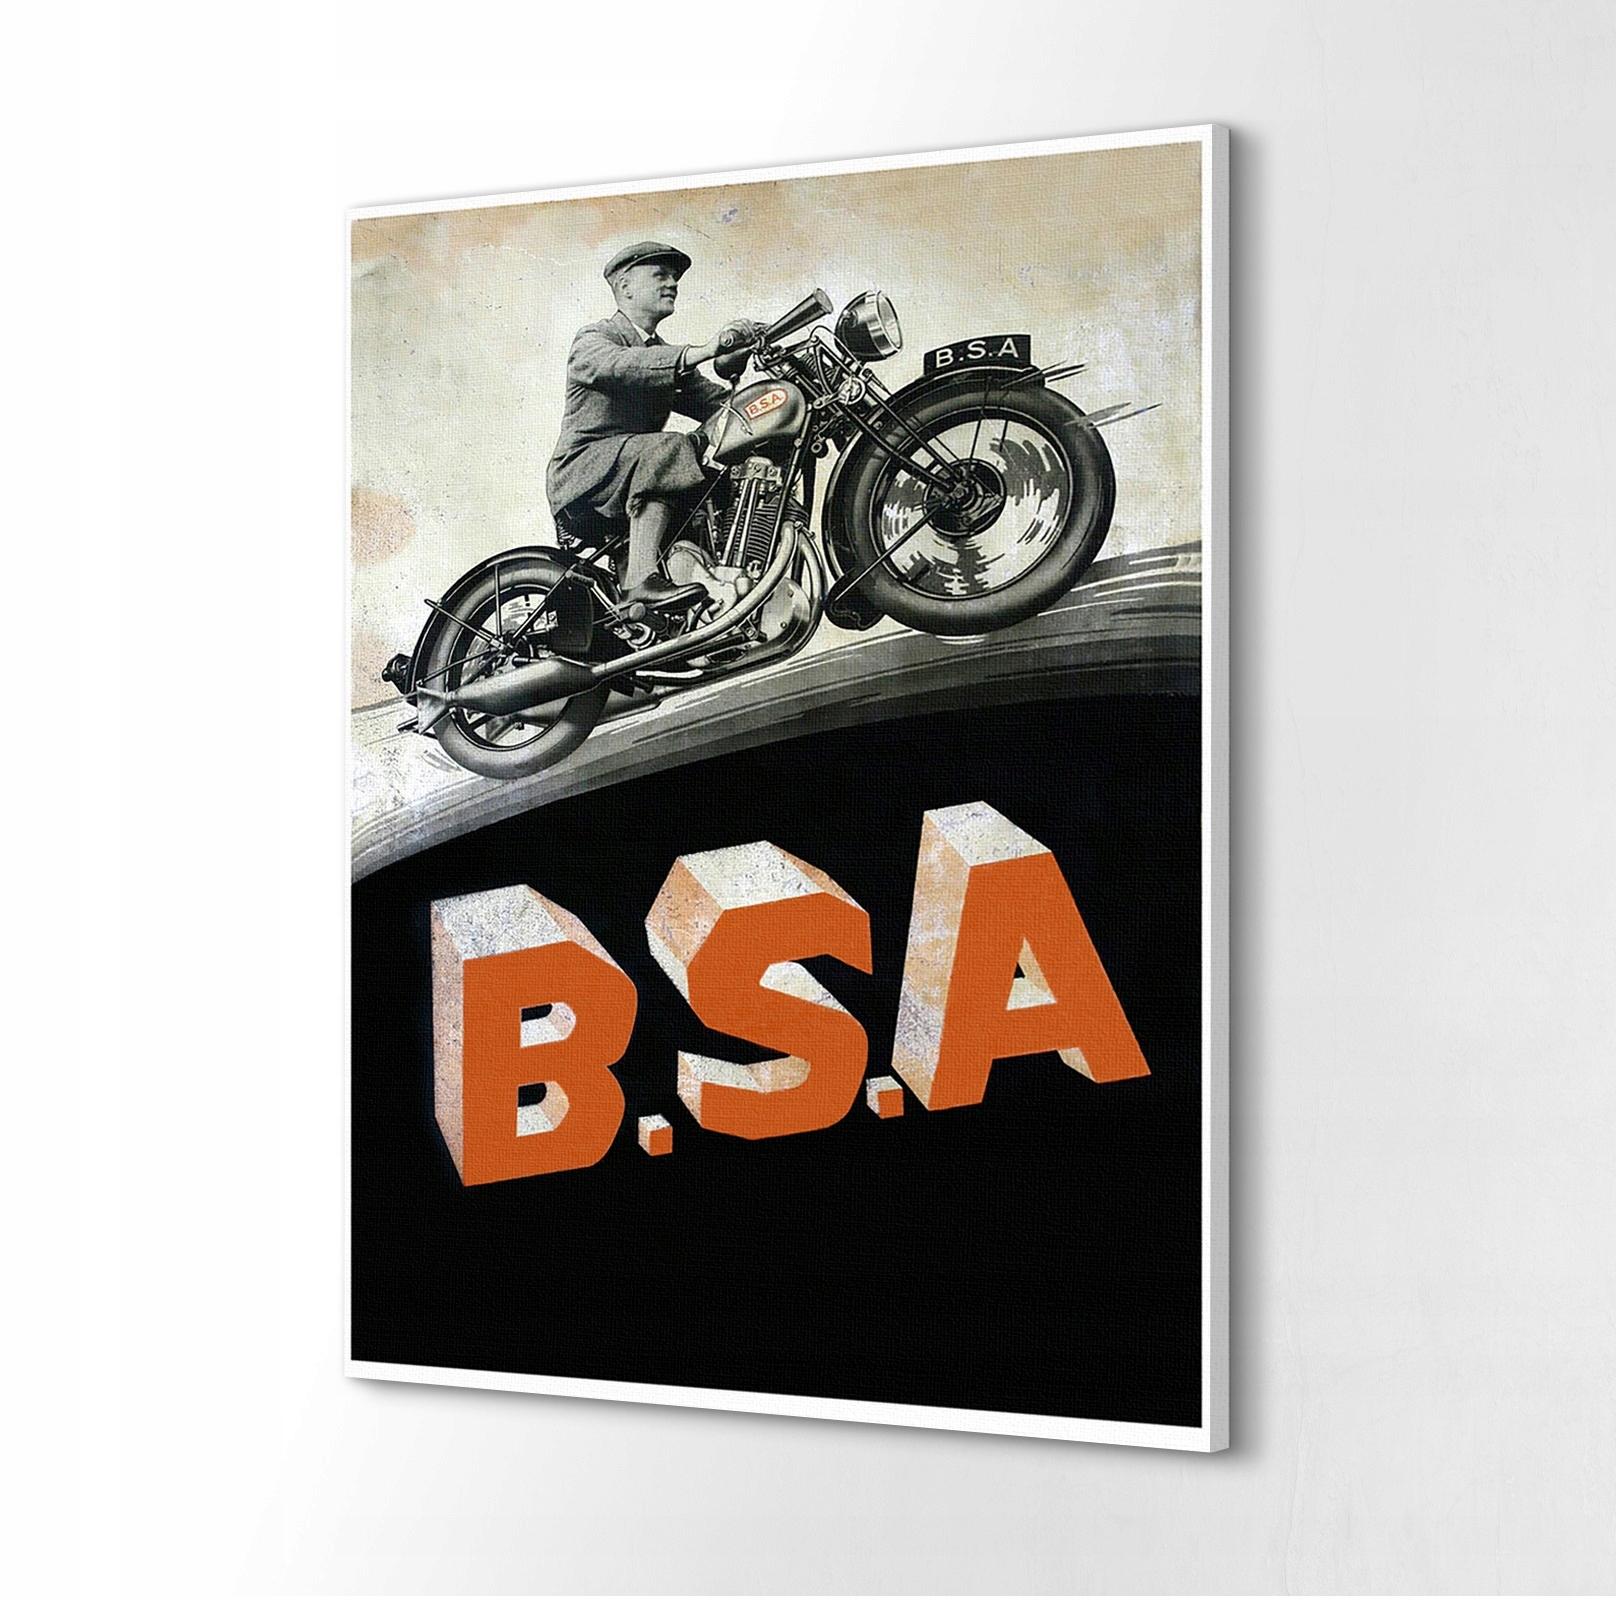 Foto obraz na plátne 60x80 Plagát Retro motocykle